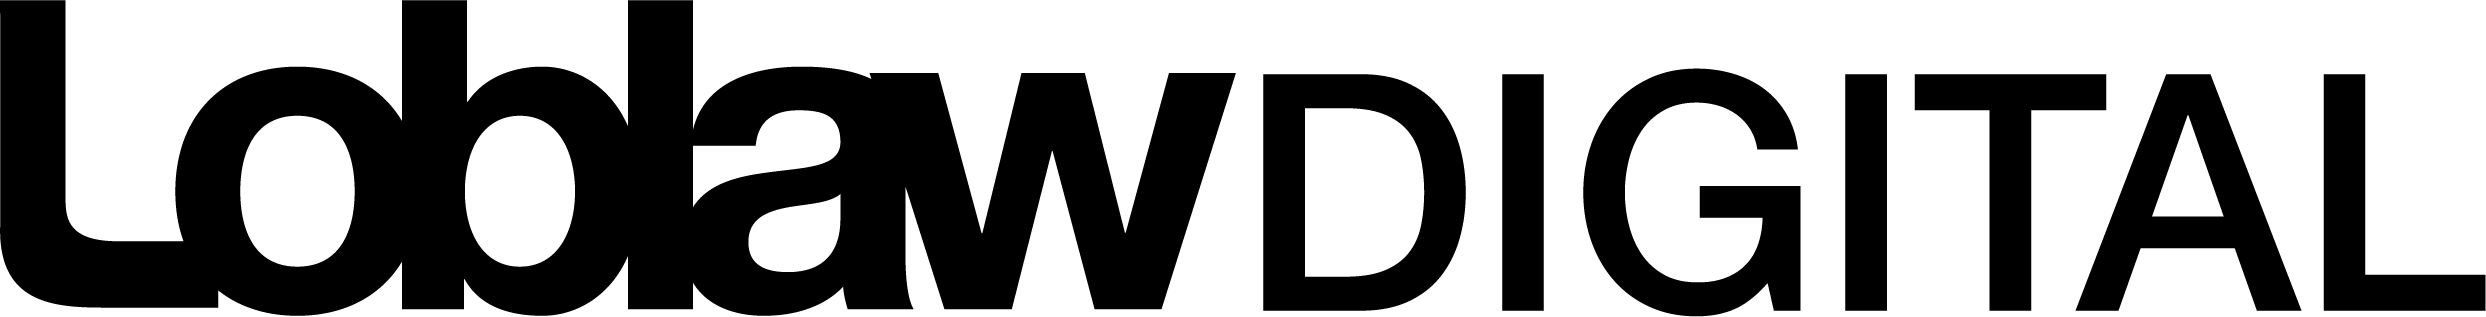 Логотип Loblaw Digital